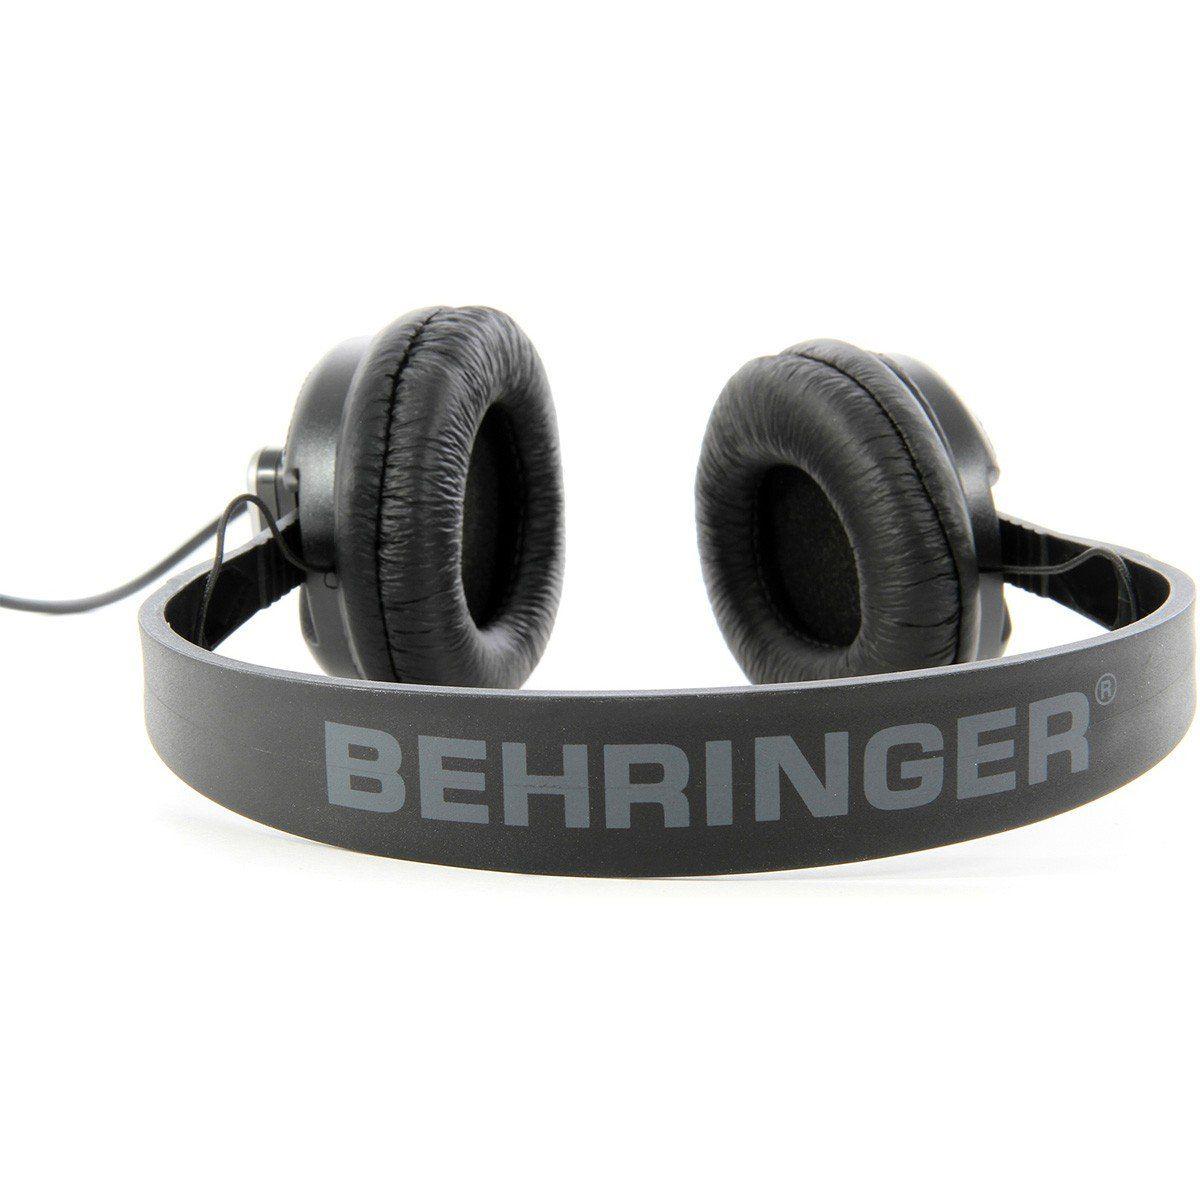 Behringer HPS5000 Fone de Ouvido HPS-5000 Fechado Profissional para Estúdio